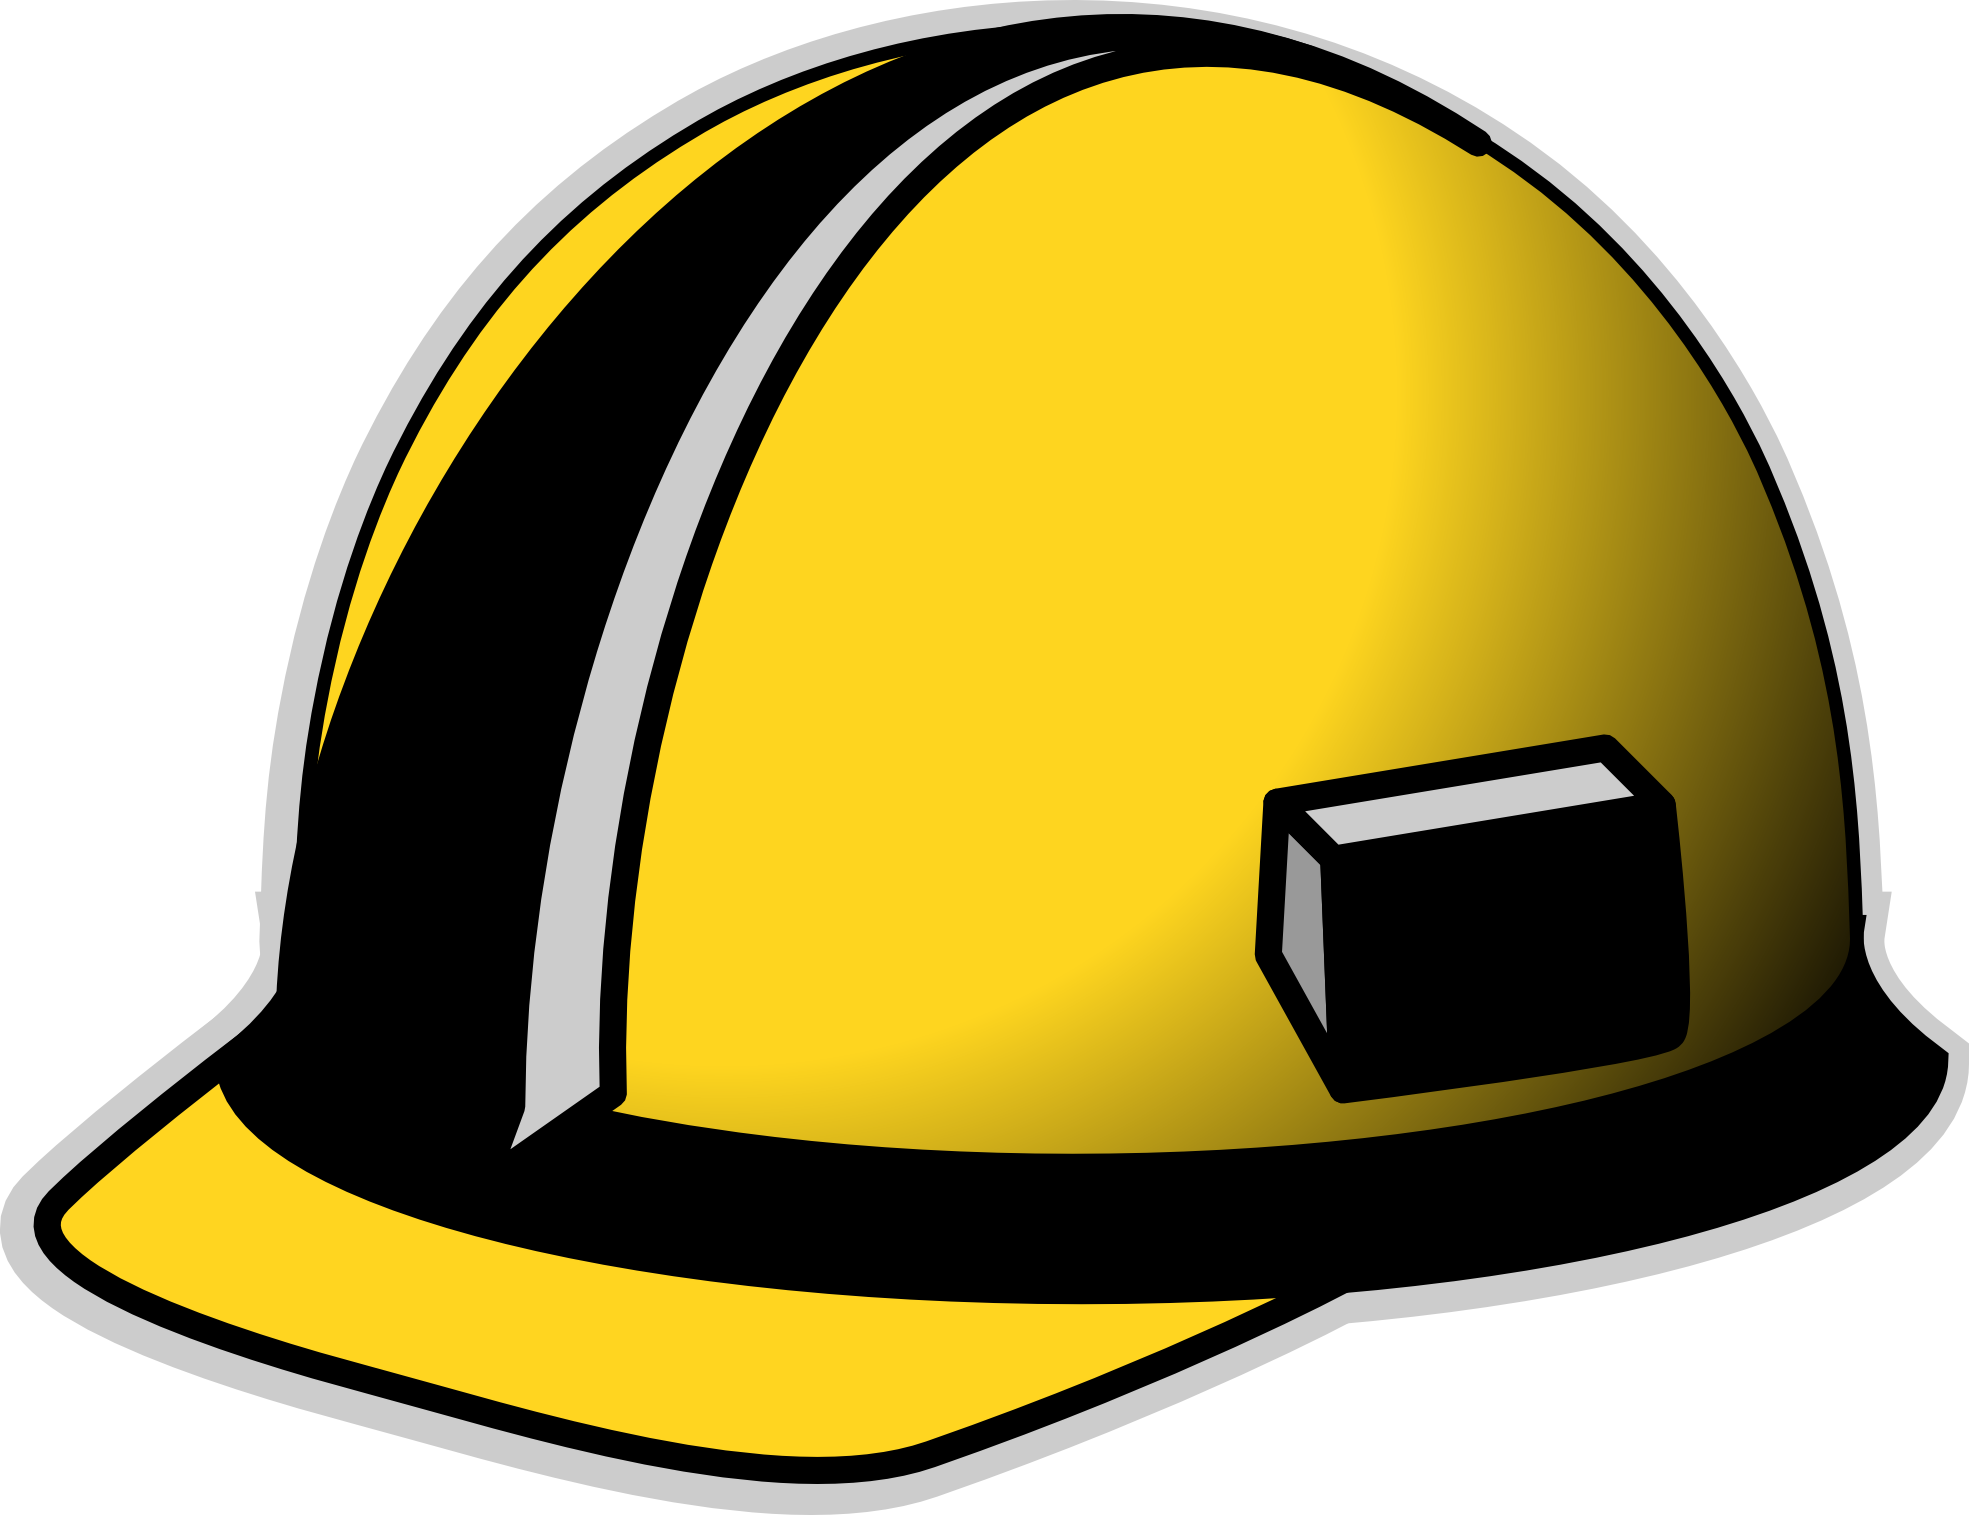 Hats clipart architect. Construction hat panda free